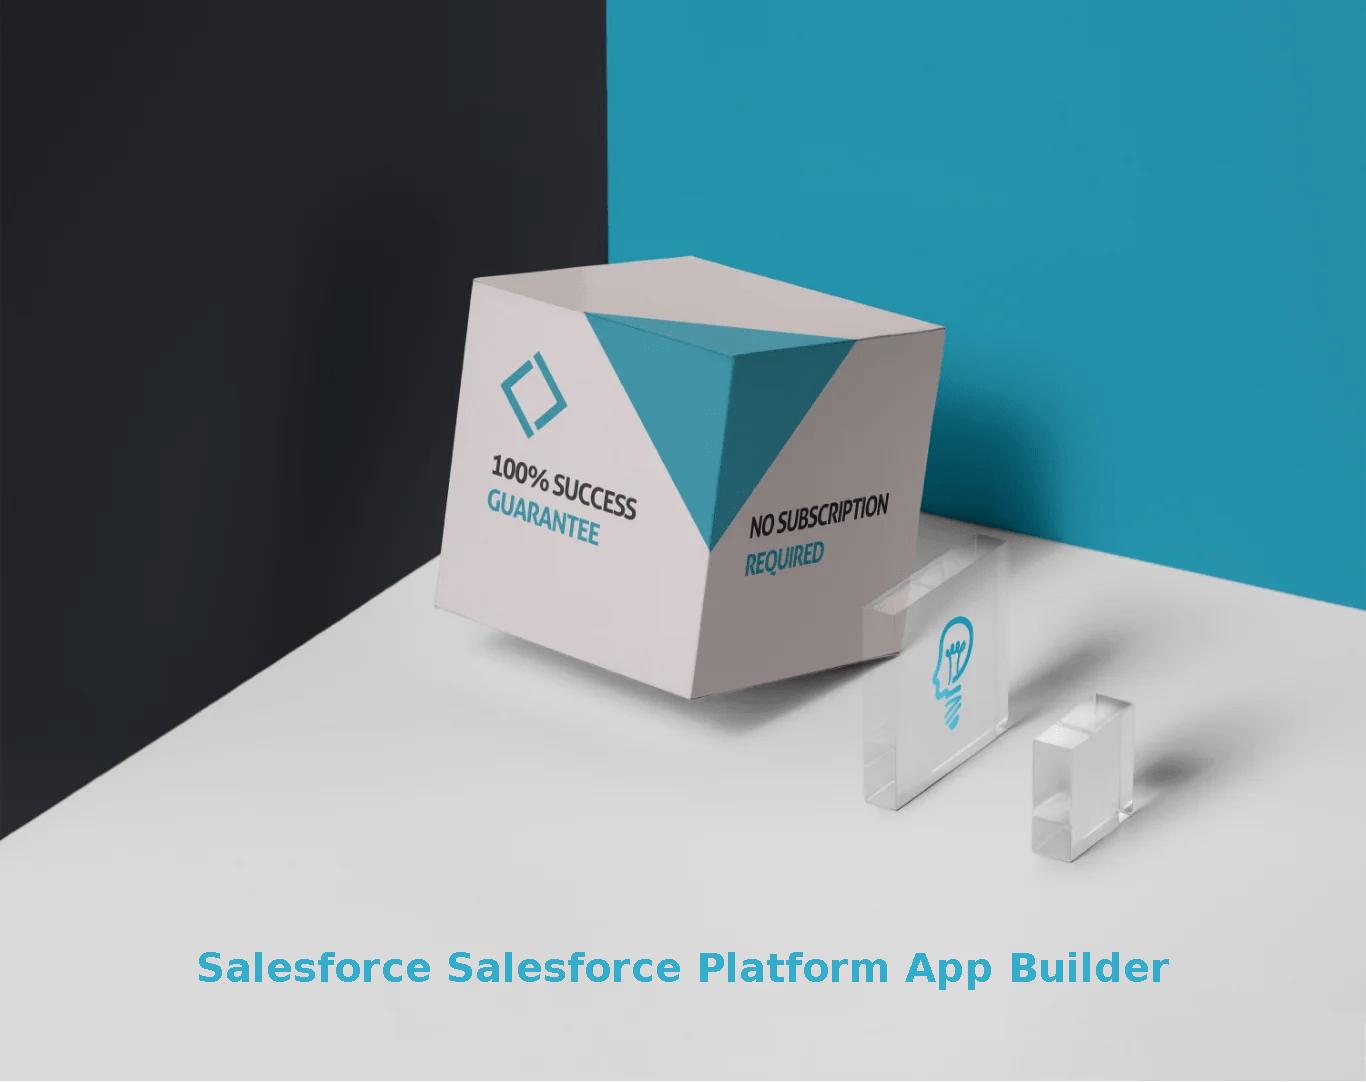 Salesforce Salesforce Platform App Builder Exams